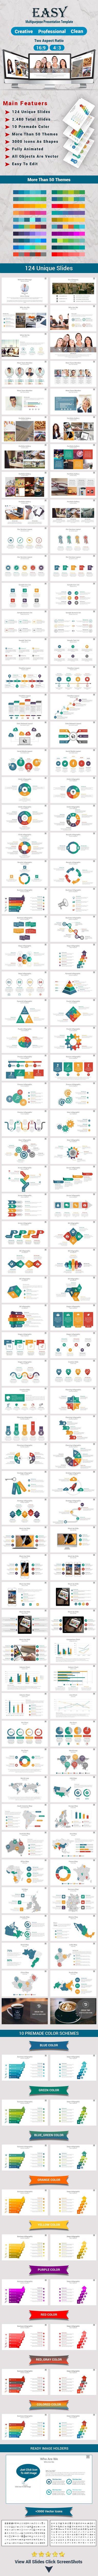 Easy Multipurpose PowerPoint Presentation Template - PowerPoint Templates Presentation Templates